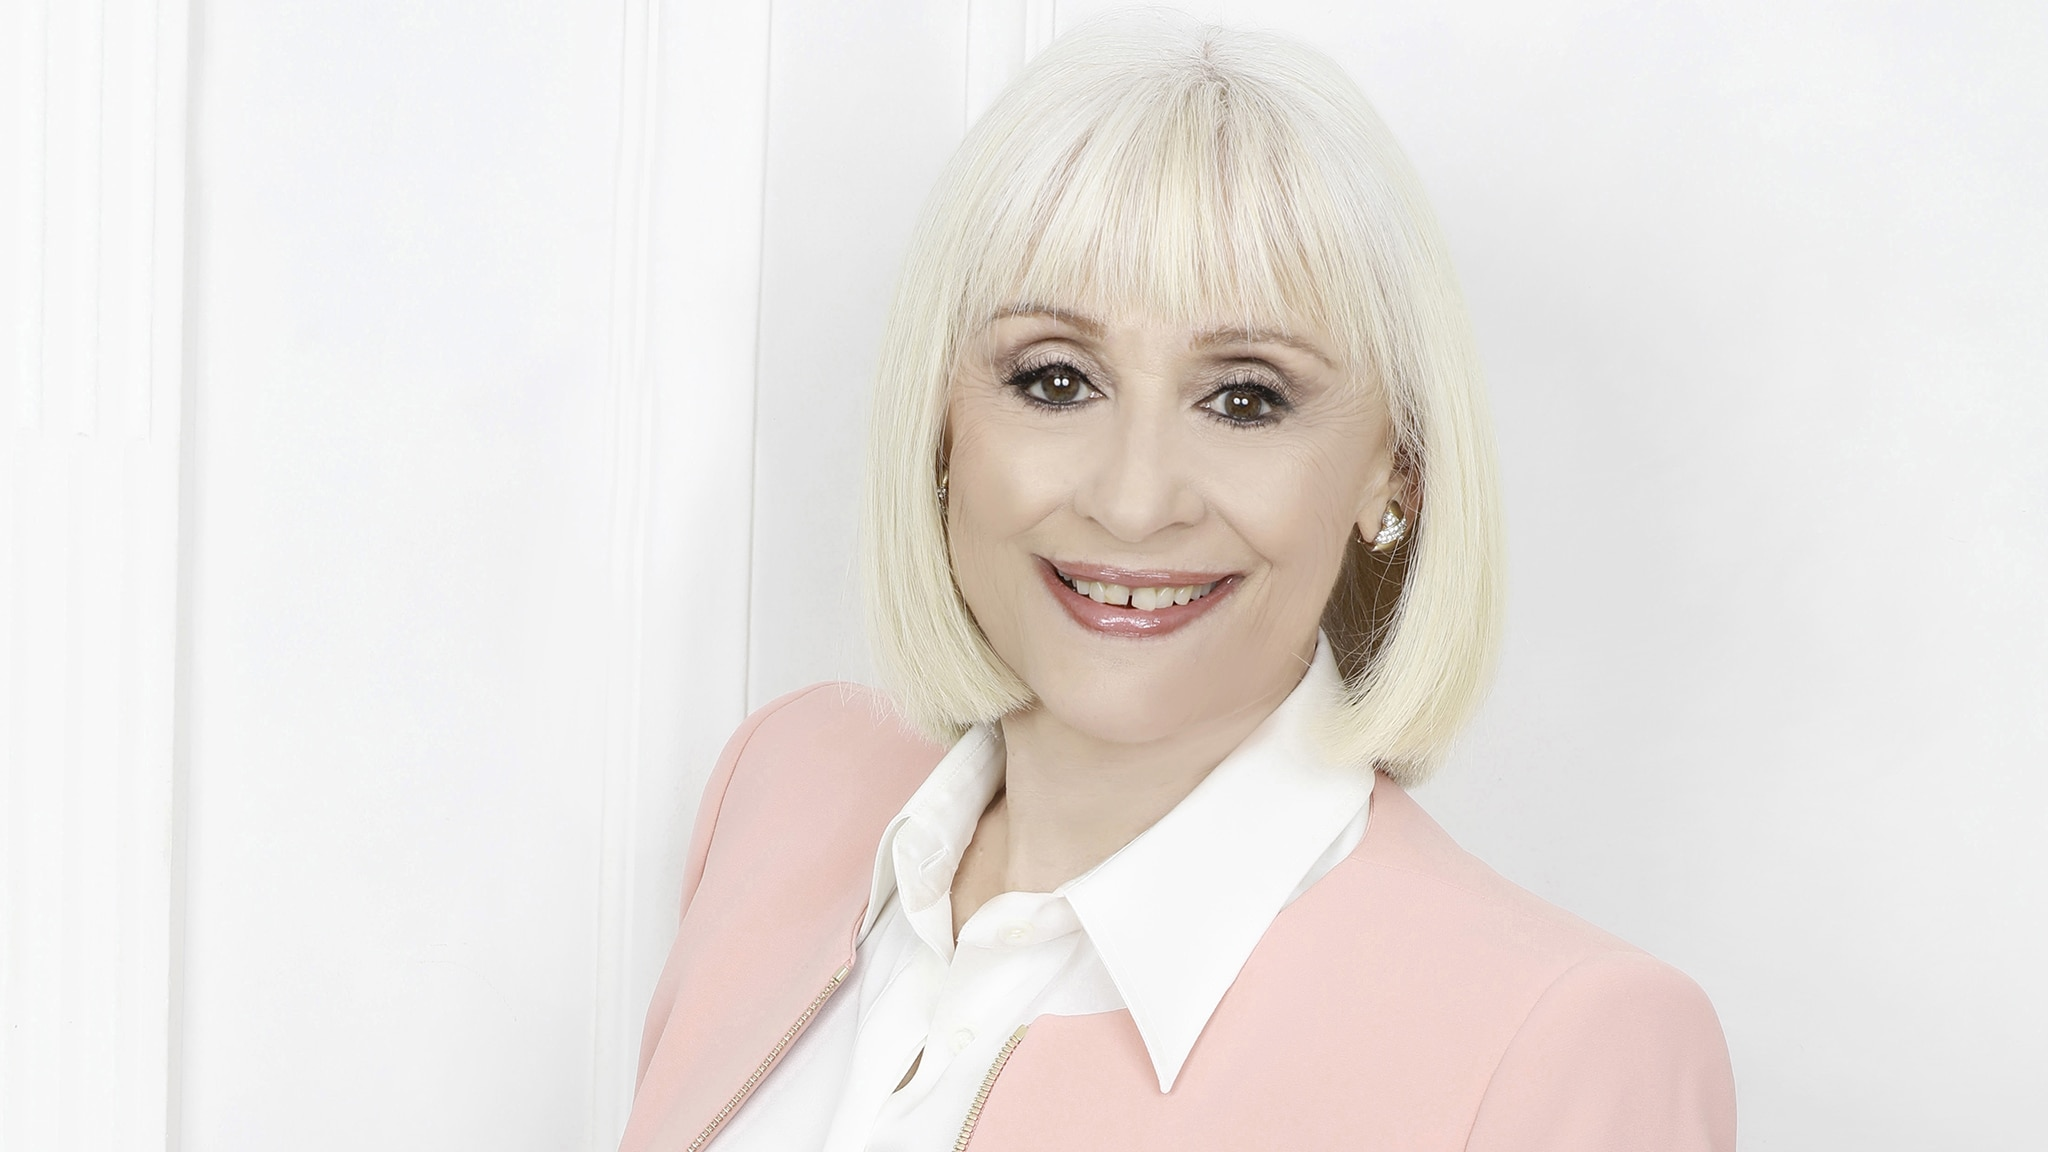 Rai 3 A raccontare comincia tu - Luciana Littizzetto